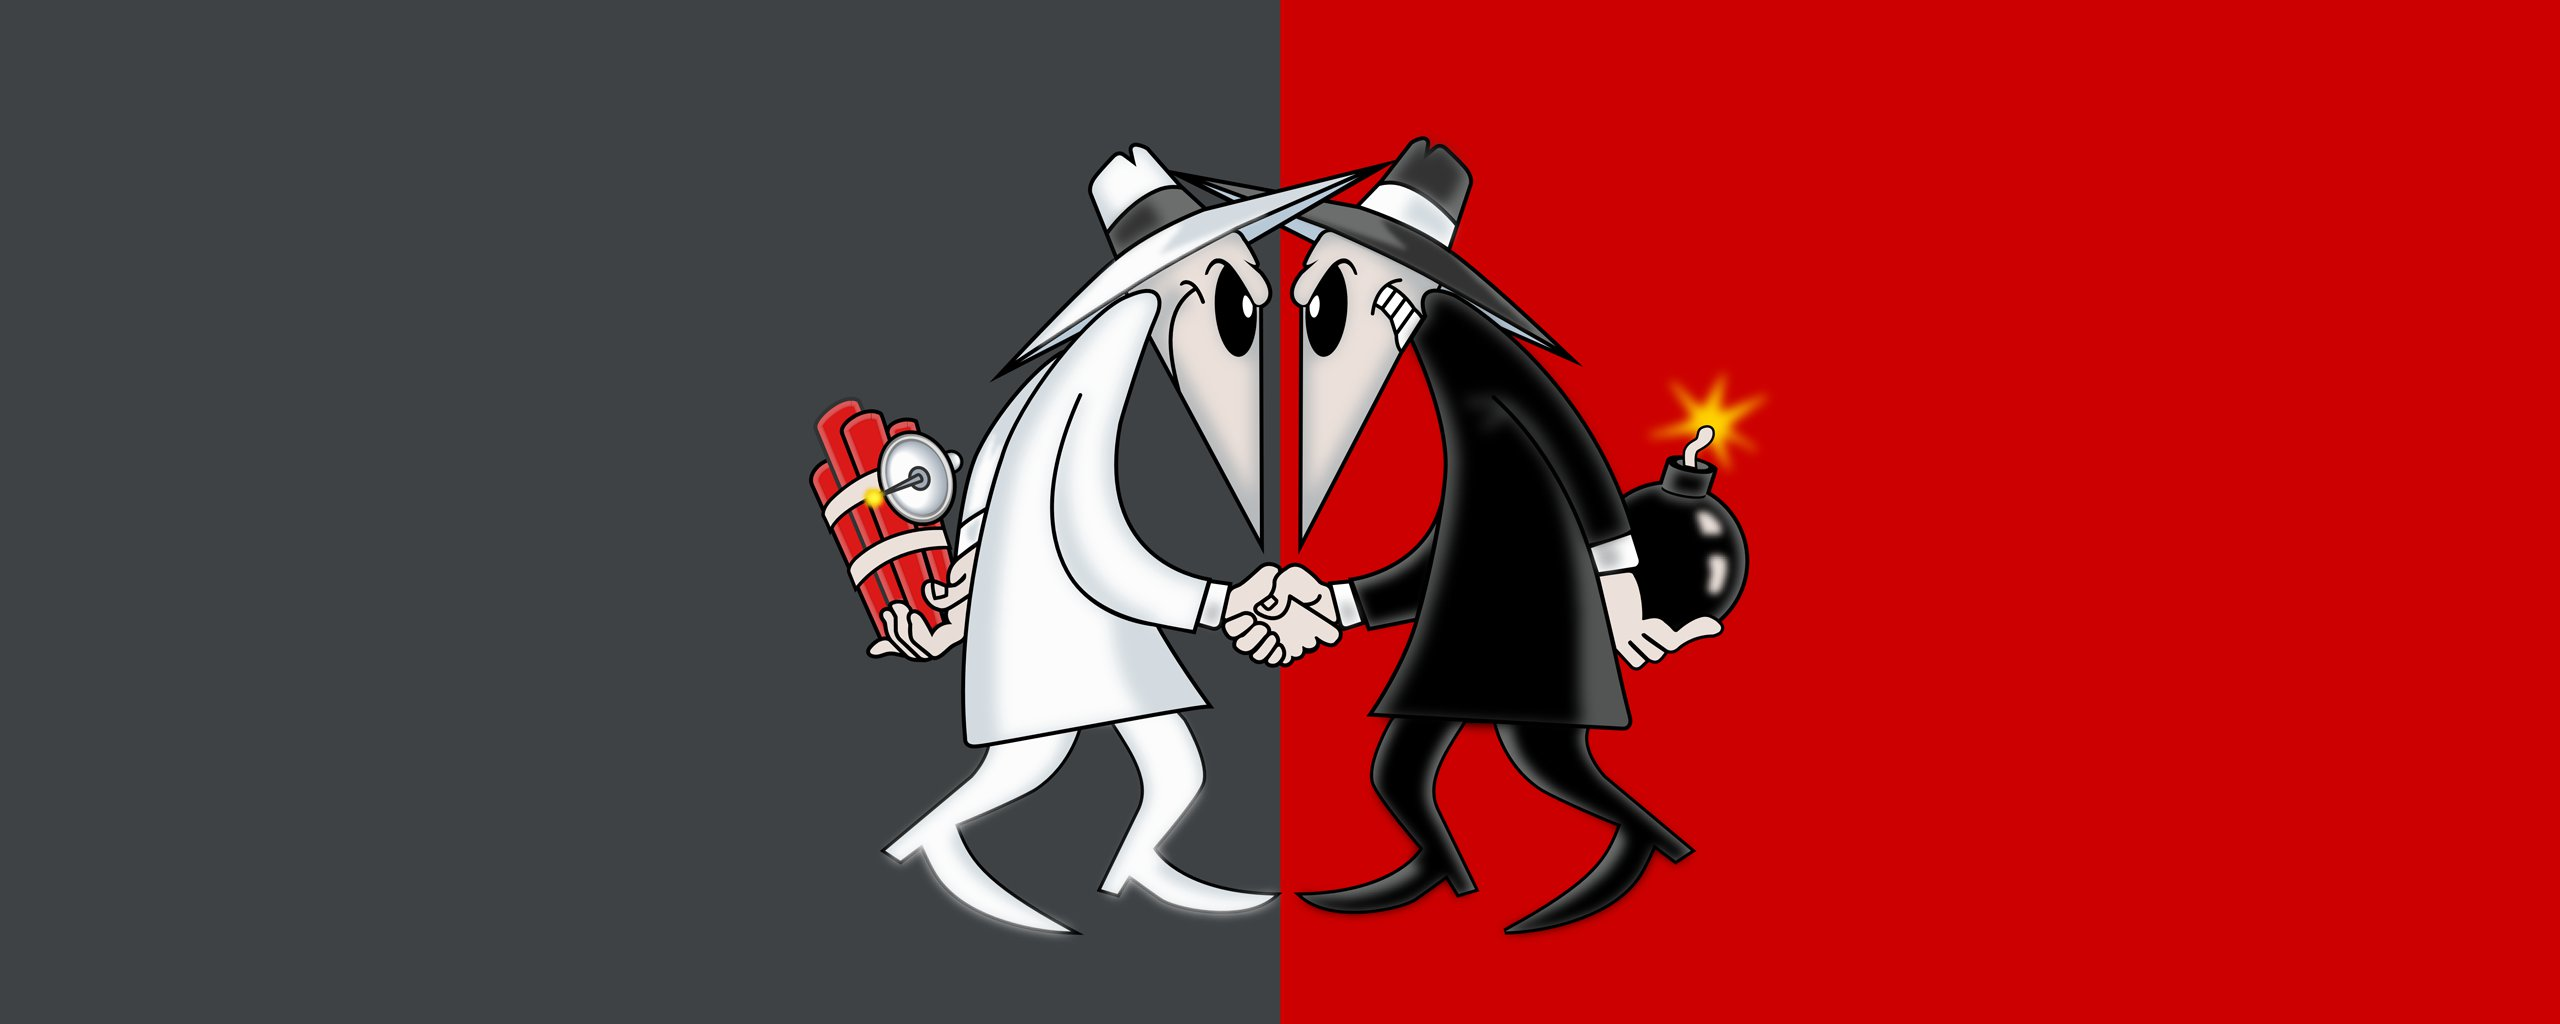 Spy vs Spy WallPaper 2560X1024 by Zarious 2560x1024